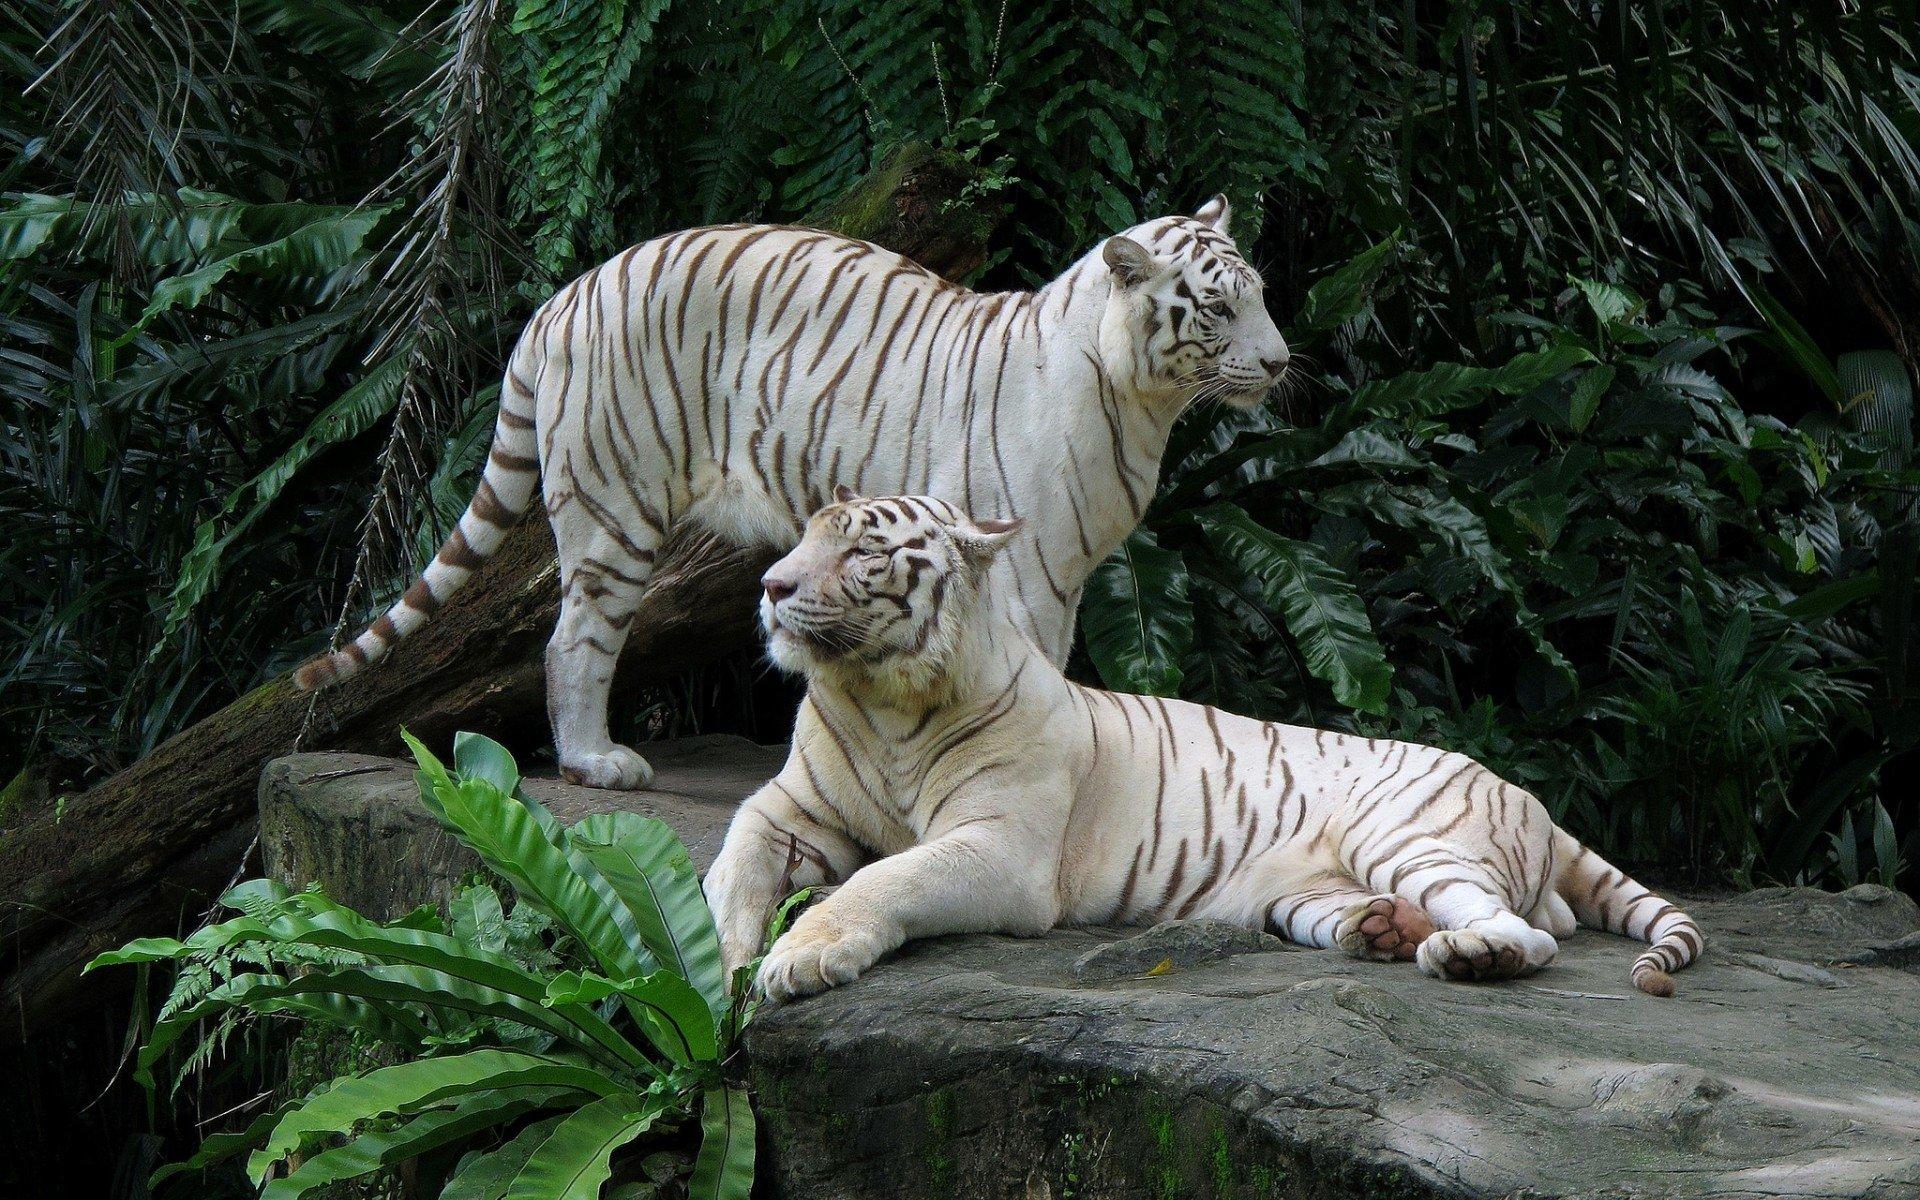 Must see Wallpaper Marvel White Tiger - thumb-1920-443944  Photograph_451639.jpg